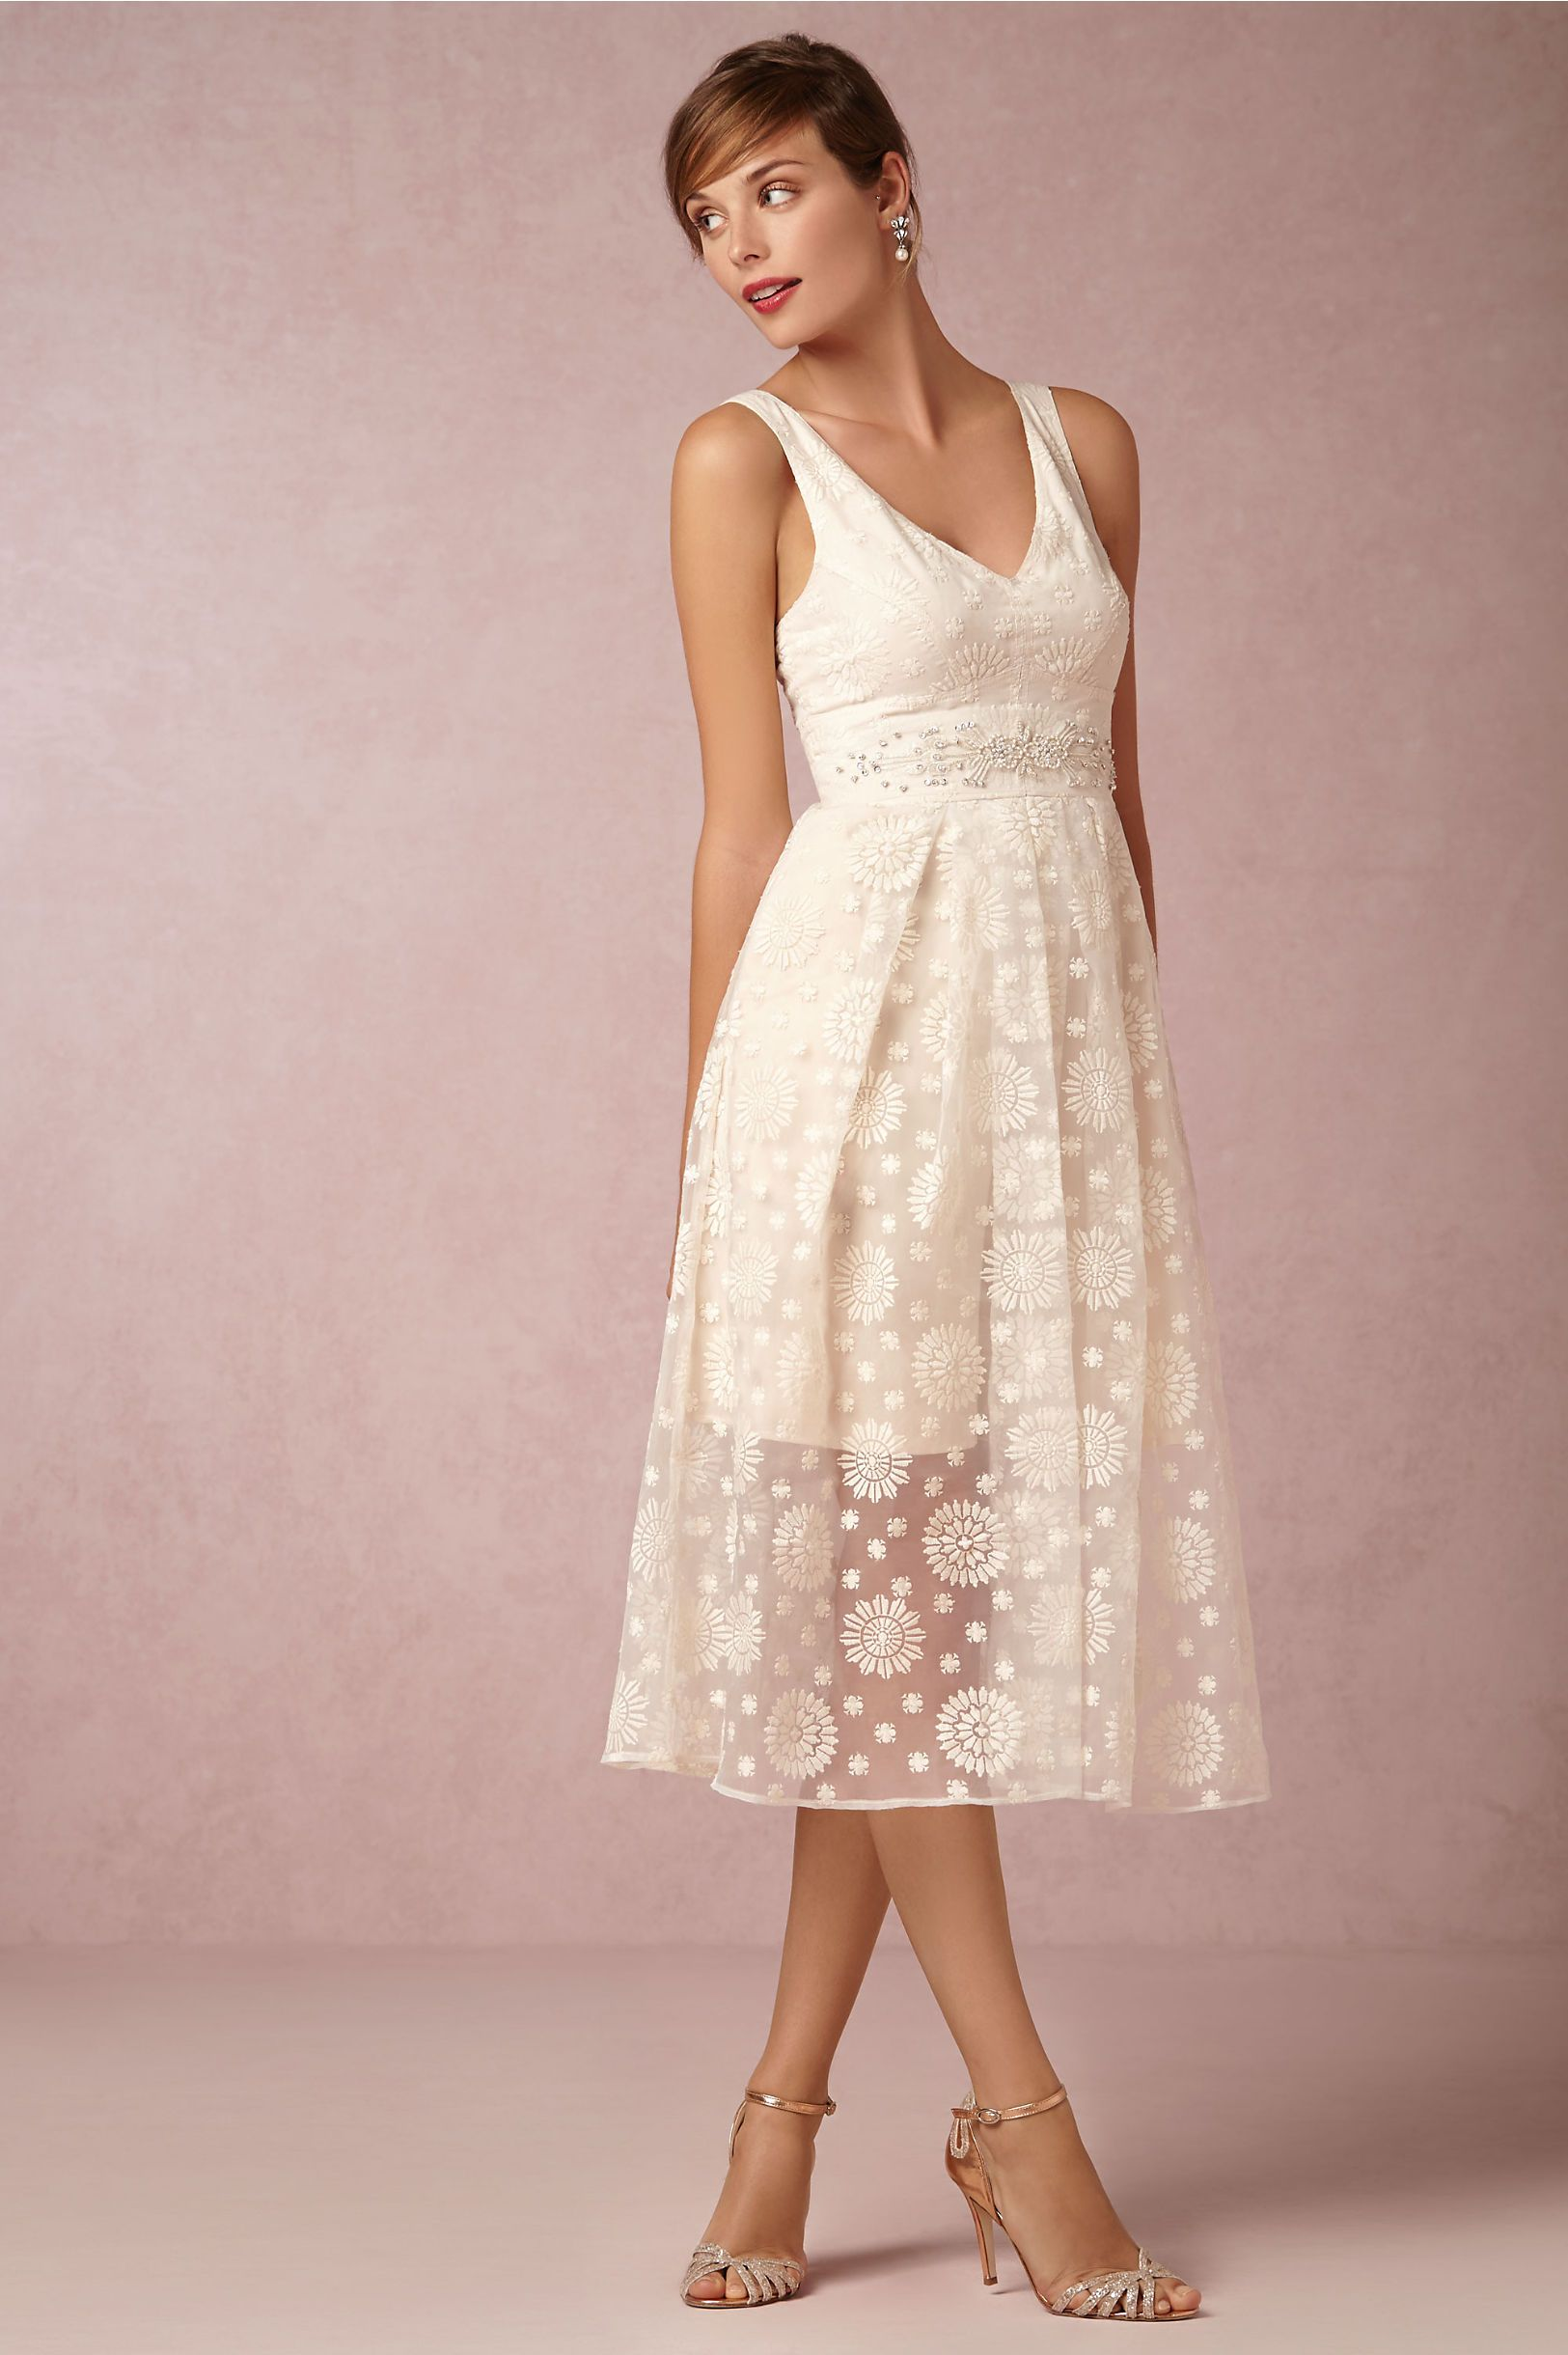 Used wedding dresses near me  Katarina Dress from BHLDN  wedding ideas  Pinterest  Practical